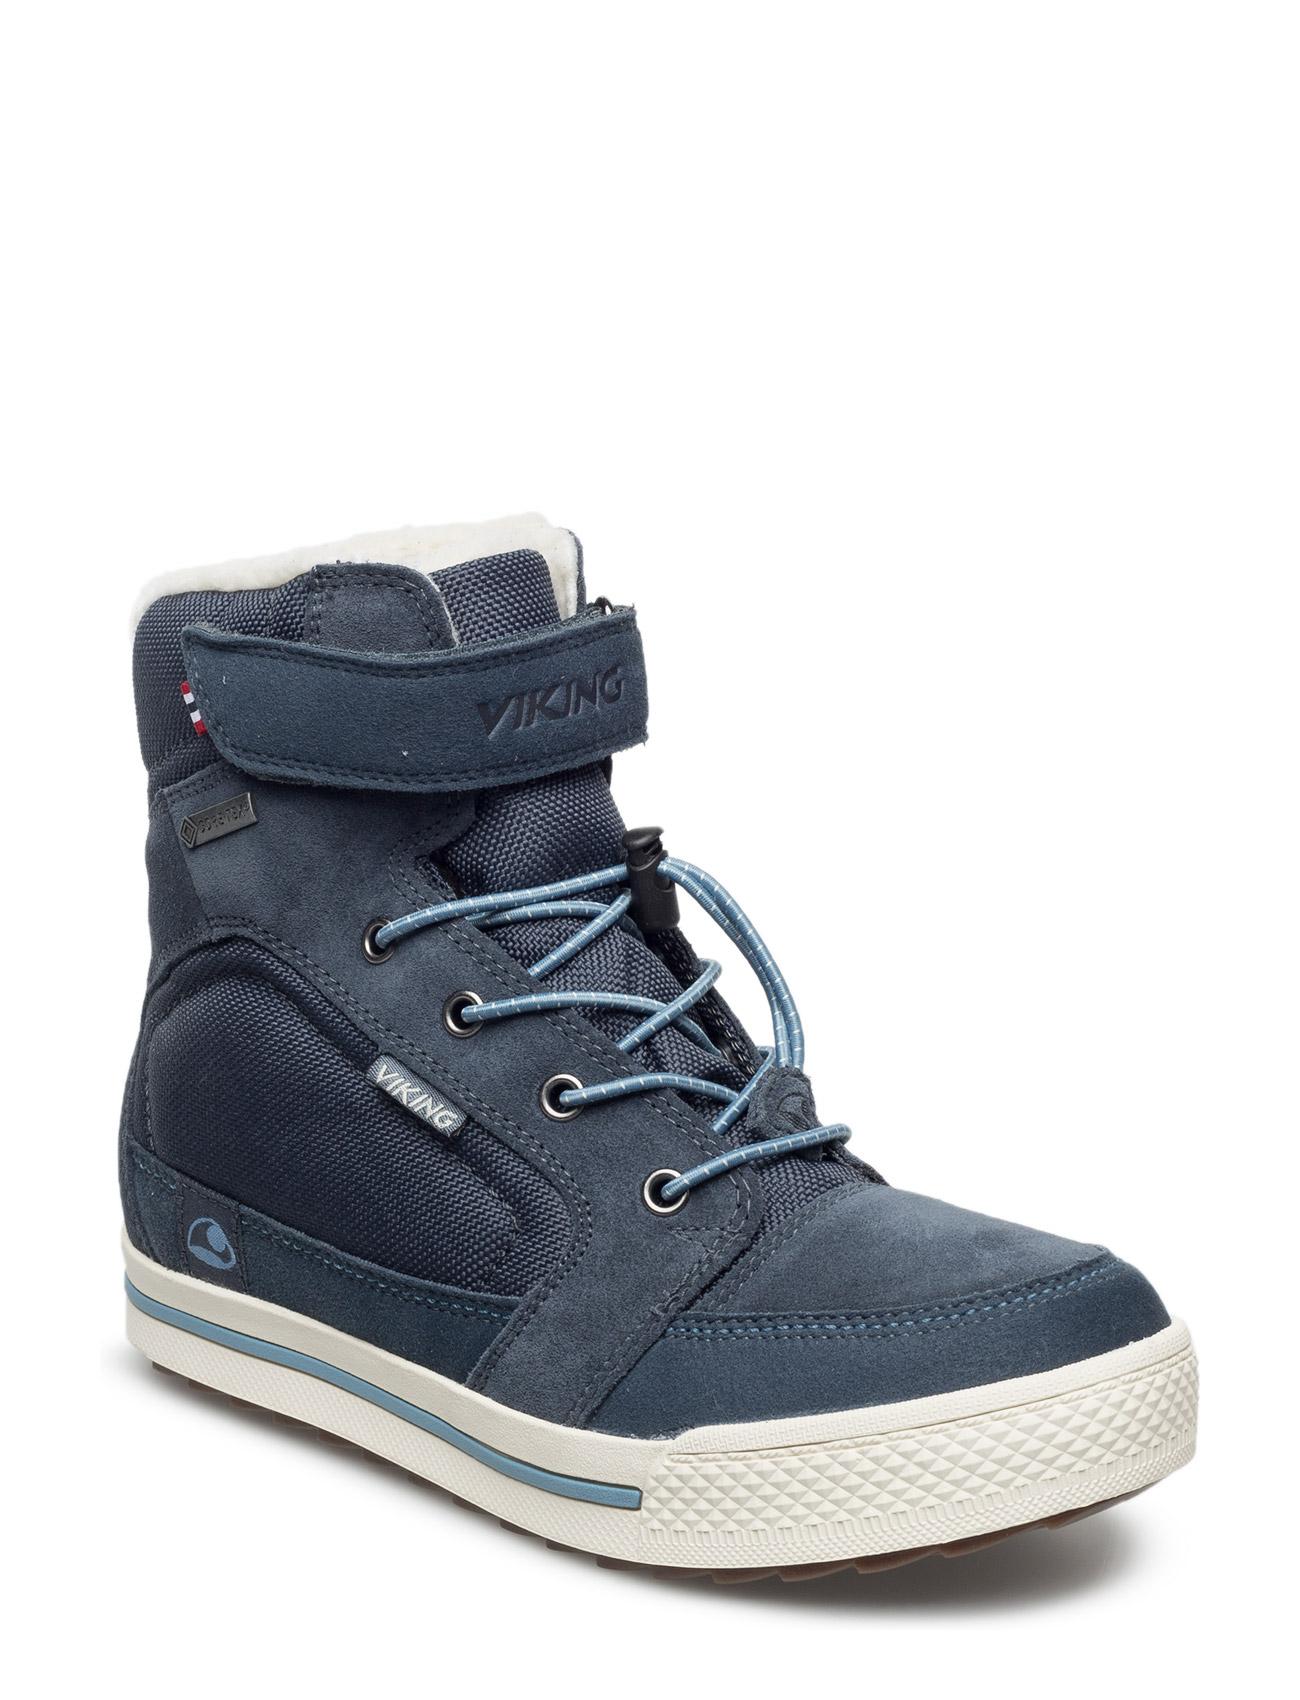 Zing Gtx Viking Sko & Sneakers til Børn i Mørkeblå